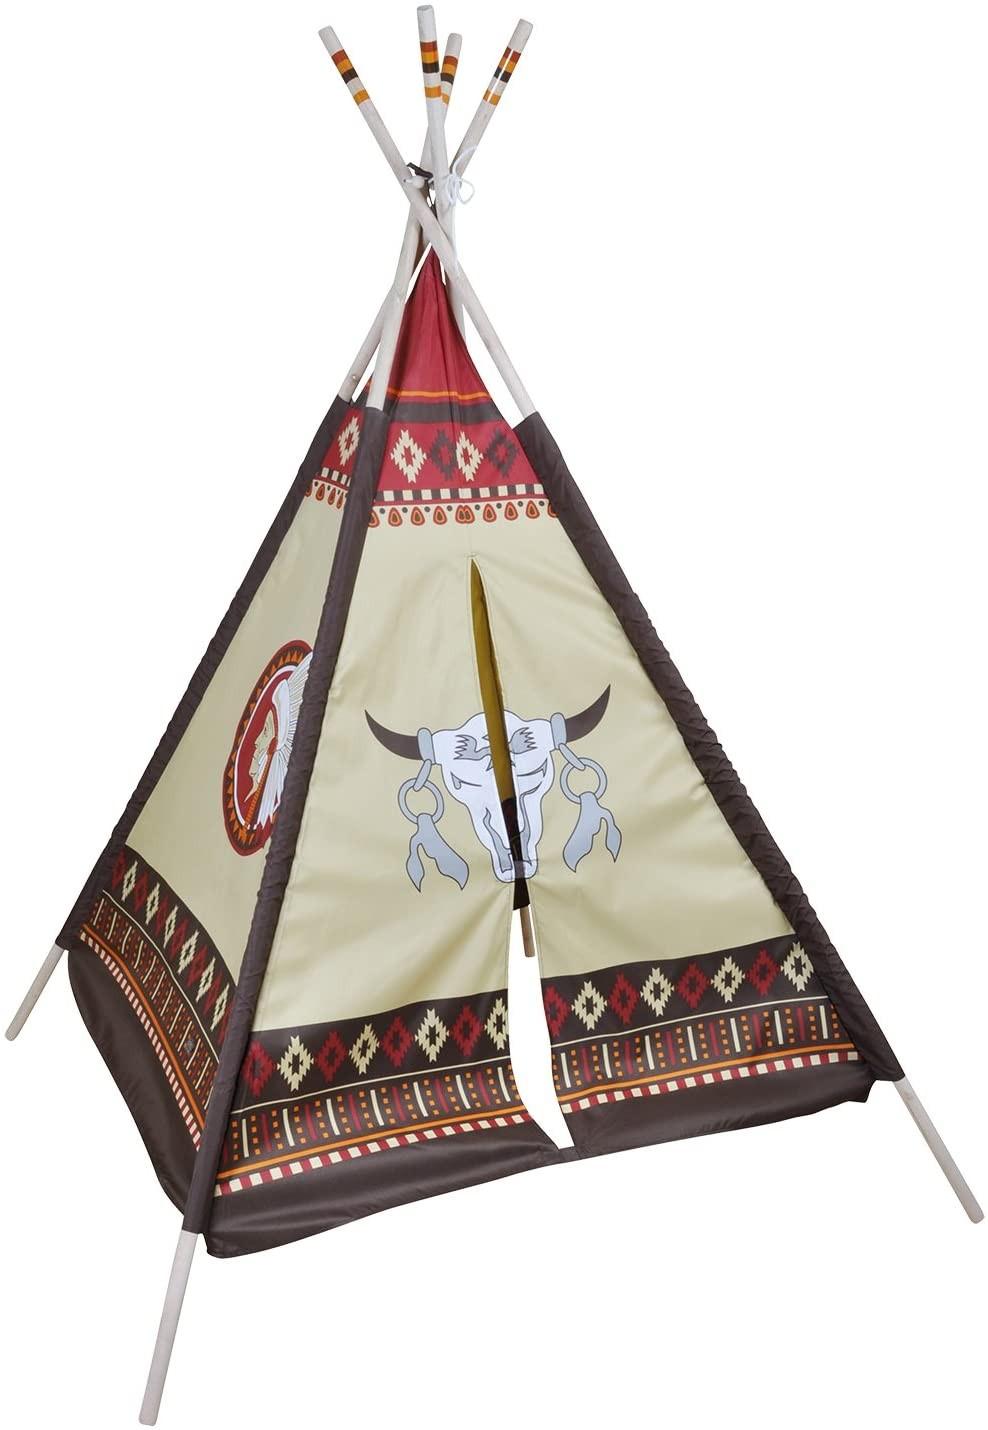 Cort de joaca pentru copii Tipi Indianer imagine